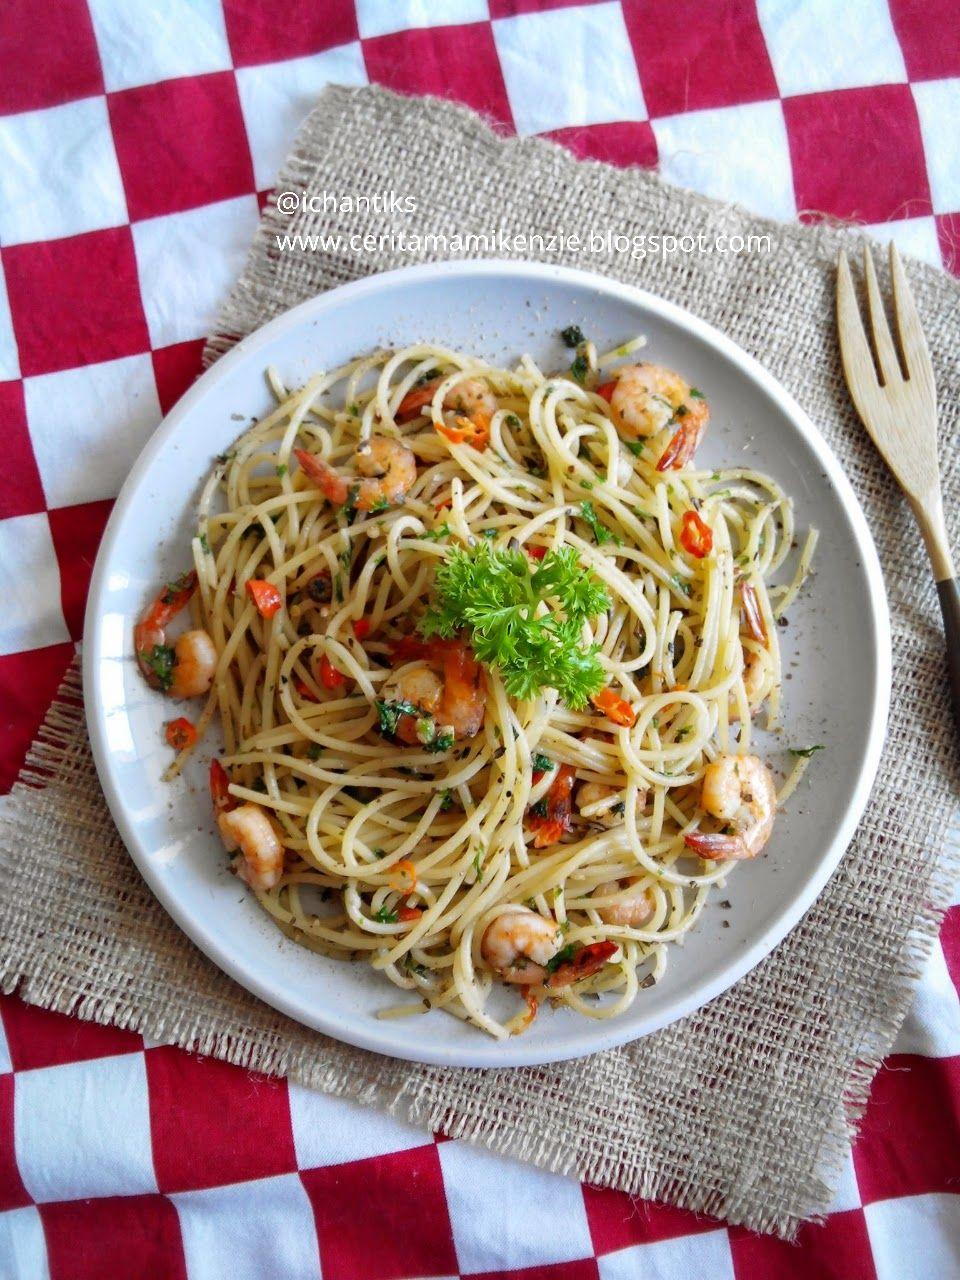 Resep Spaghetti Aglio Olio Cerita Mami Kenzie Makanan Italia Makan Malam Resep Masakan